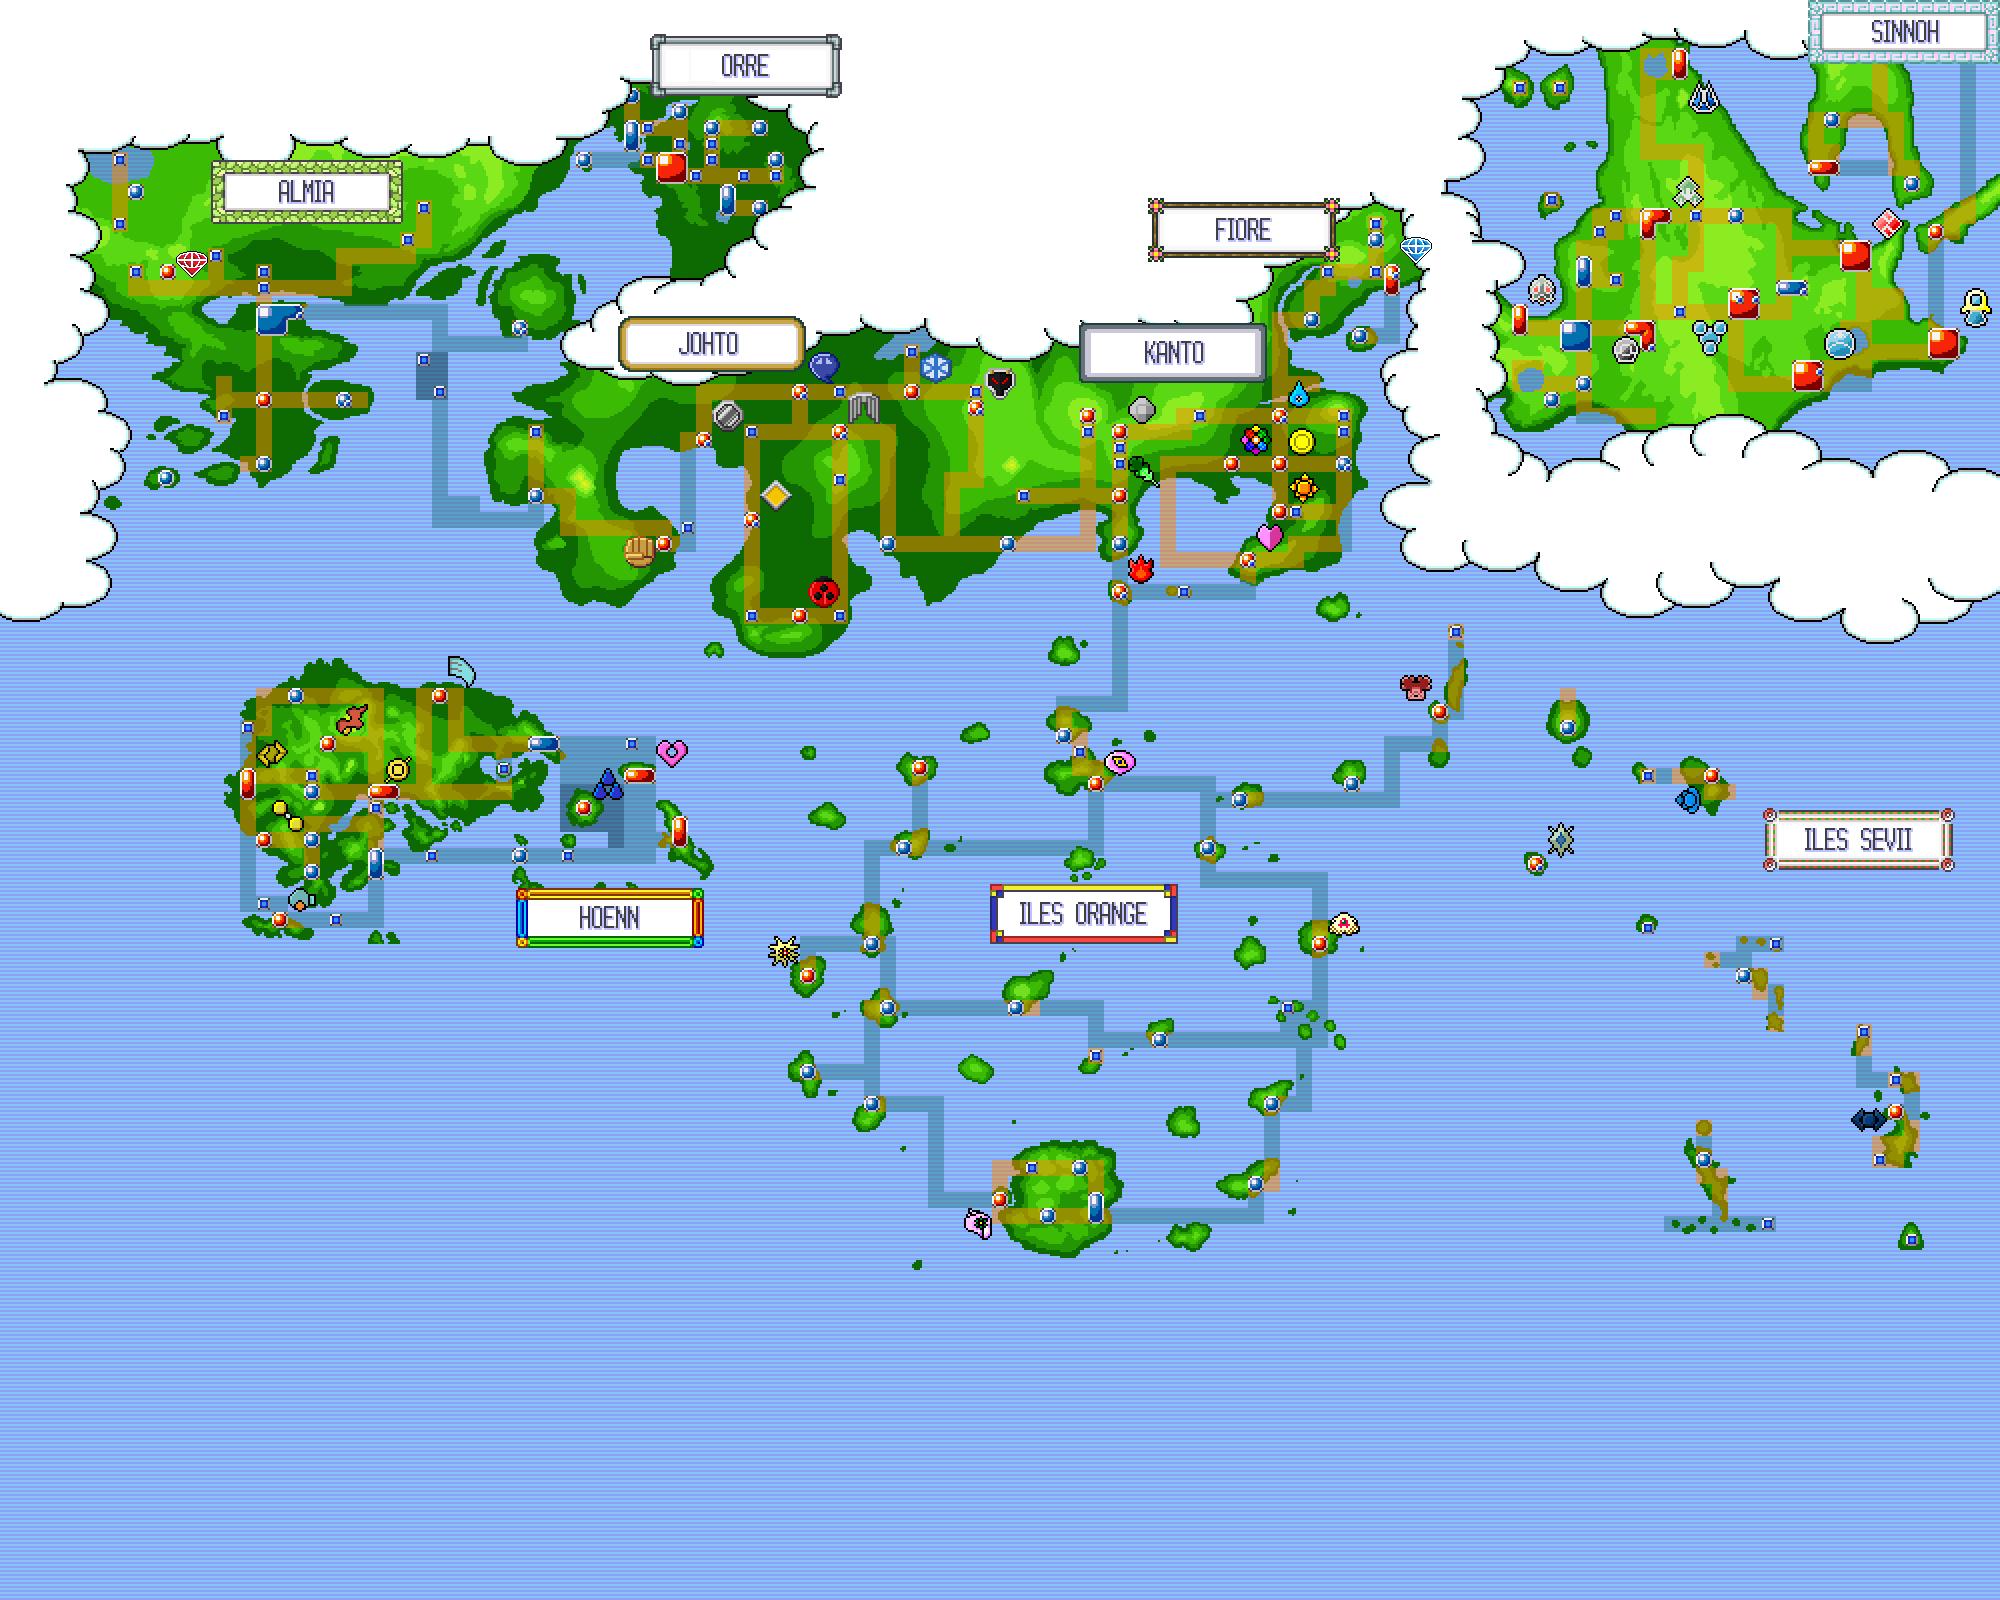 Pokemon world map by thomas999 on DeviantArt